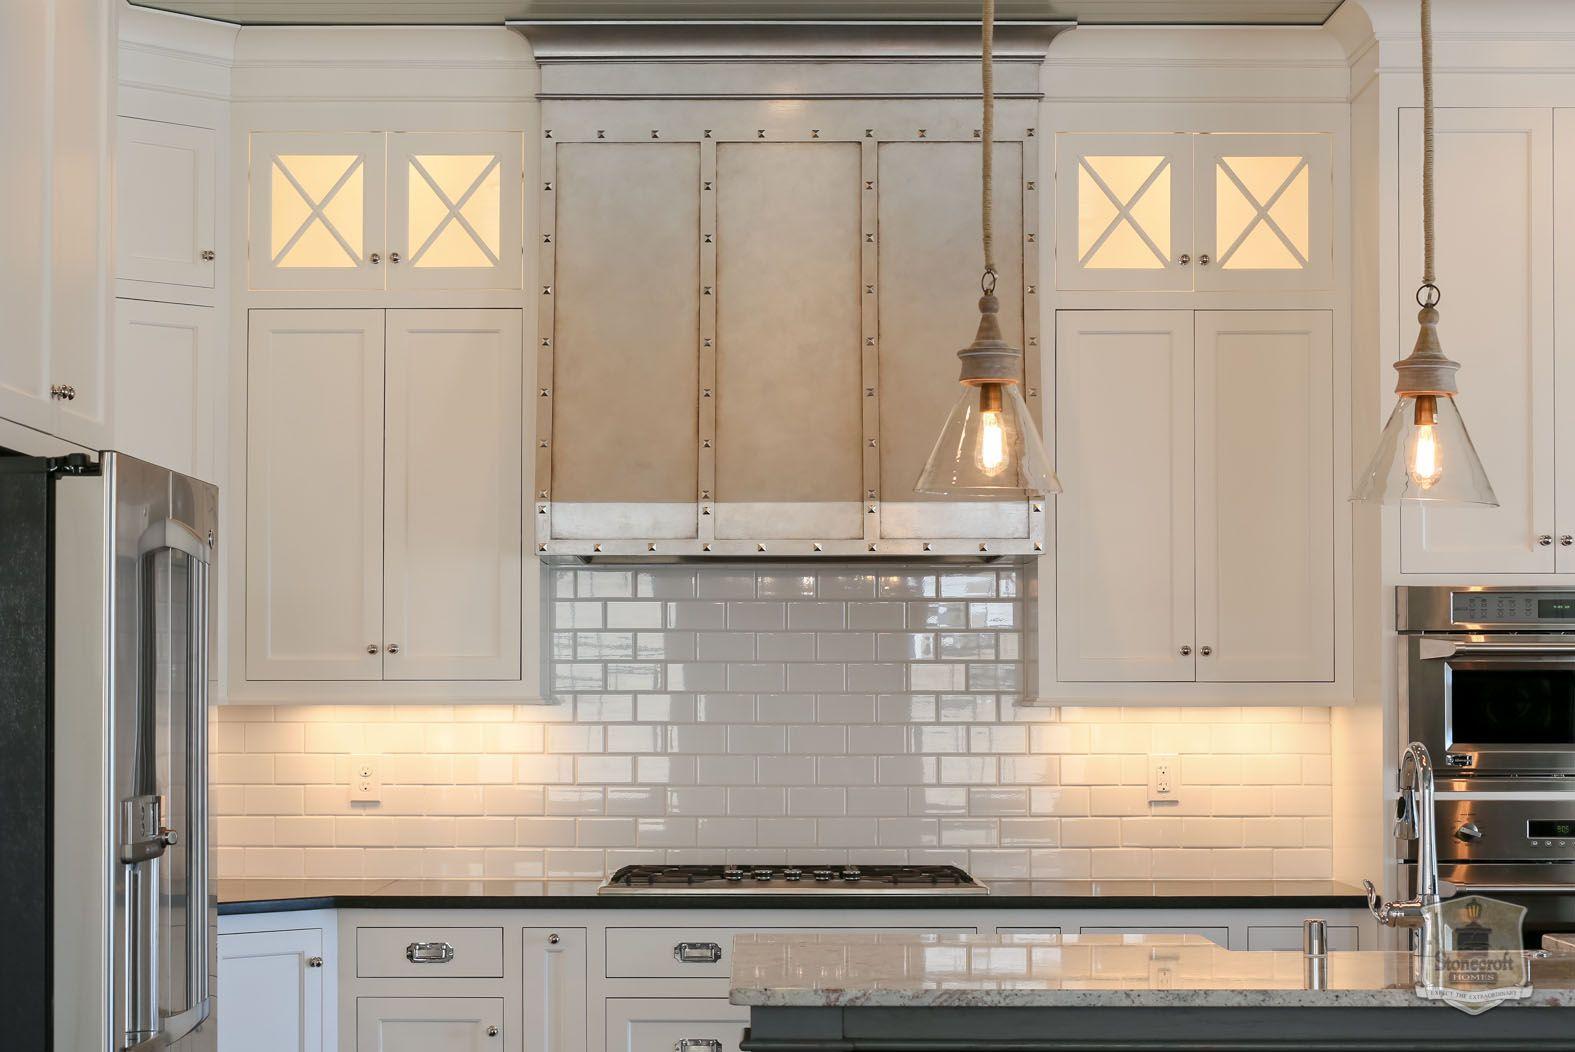 Stonecroft Homes The Gq Louisville Custom Builder Shaker Style Kitchen Cabinets Shaker Style Kitchens Kitchen Hoods